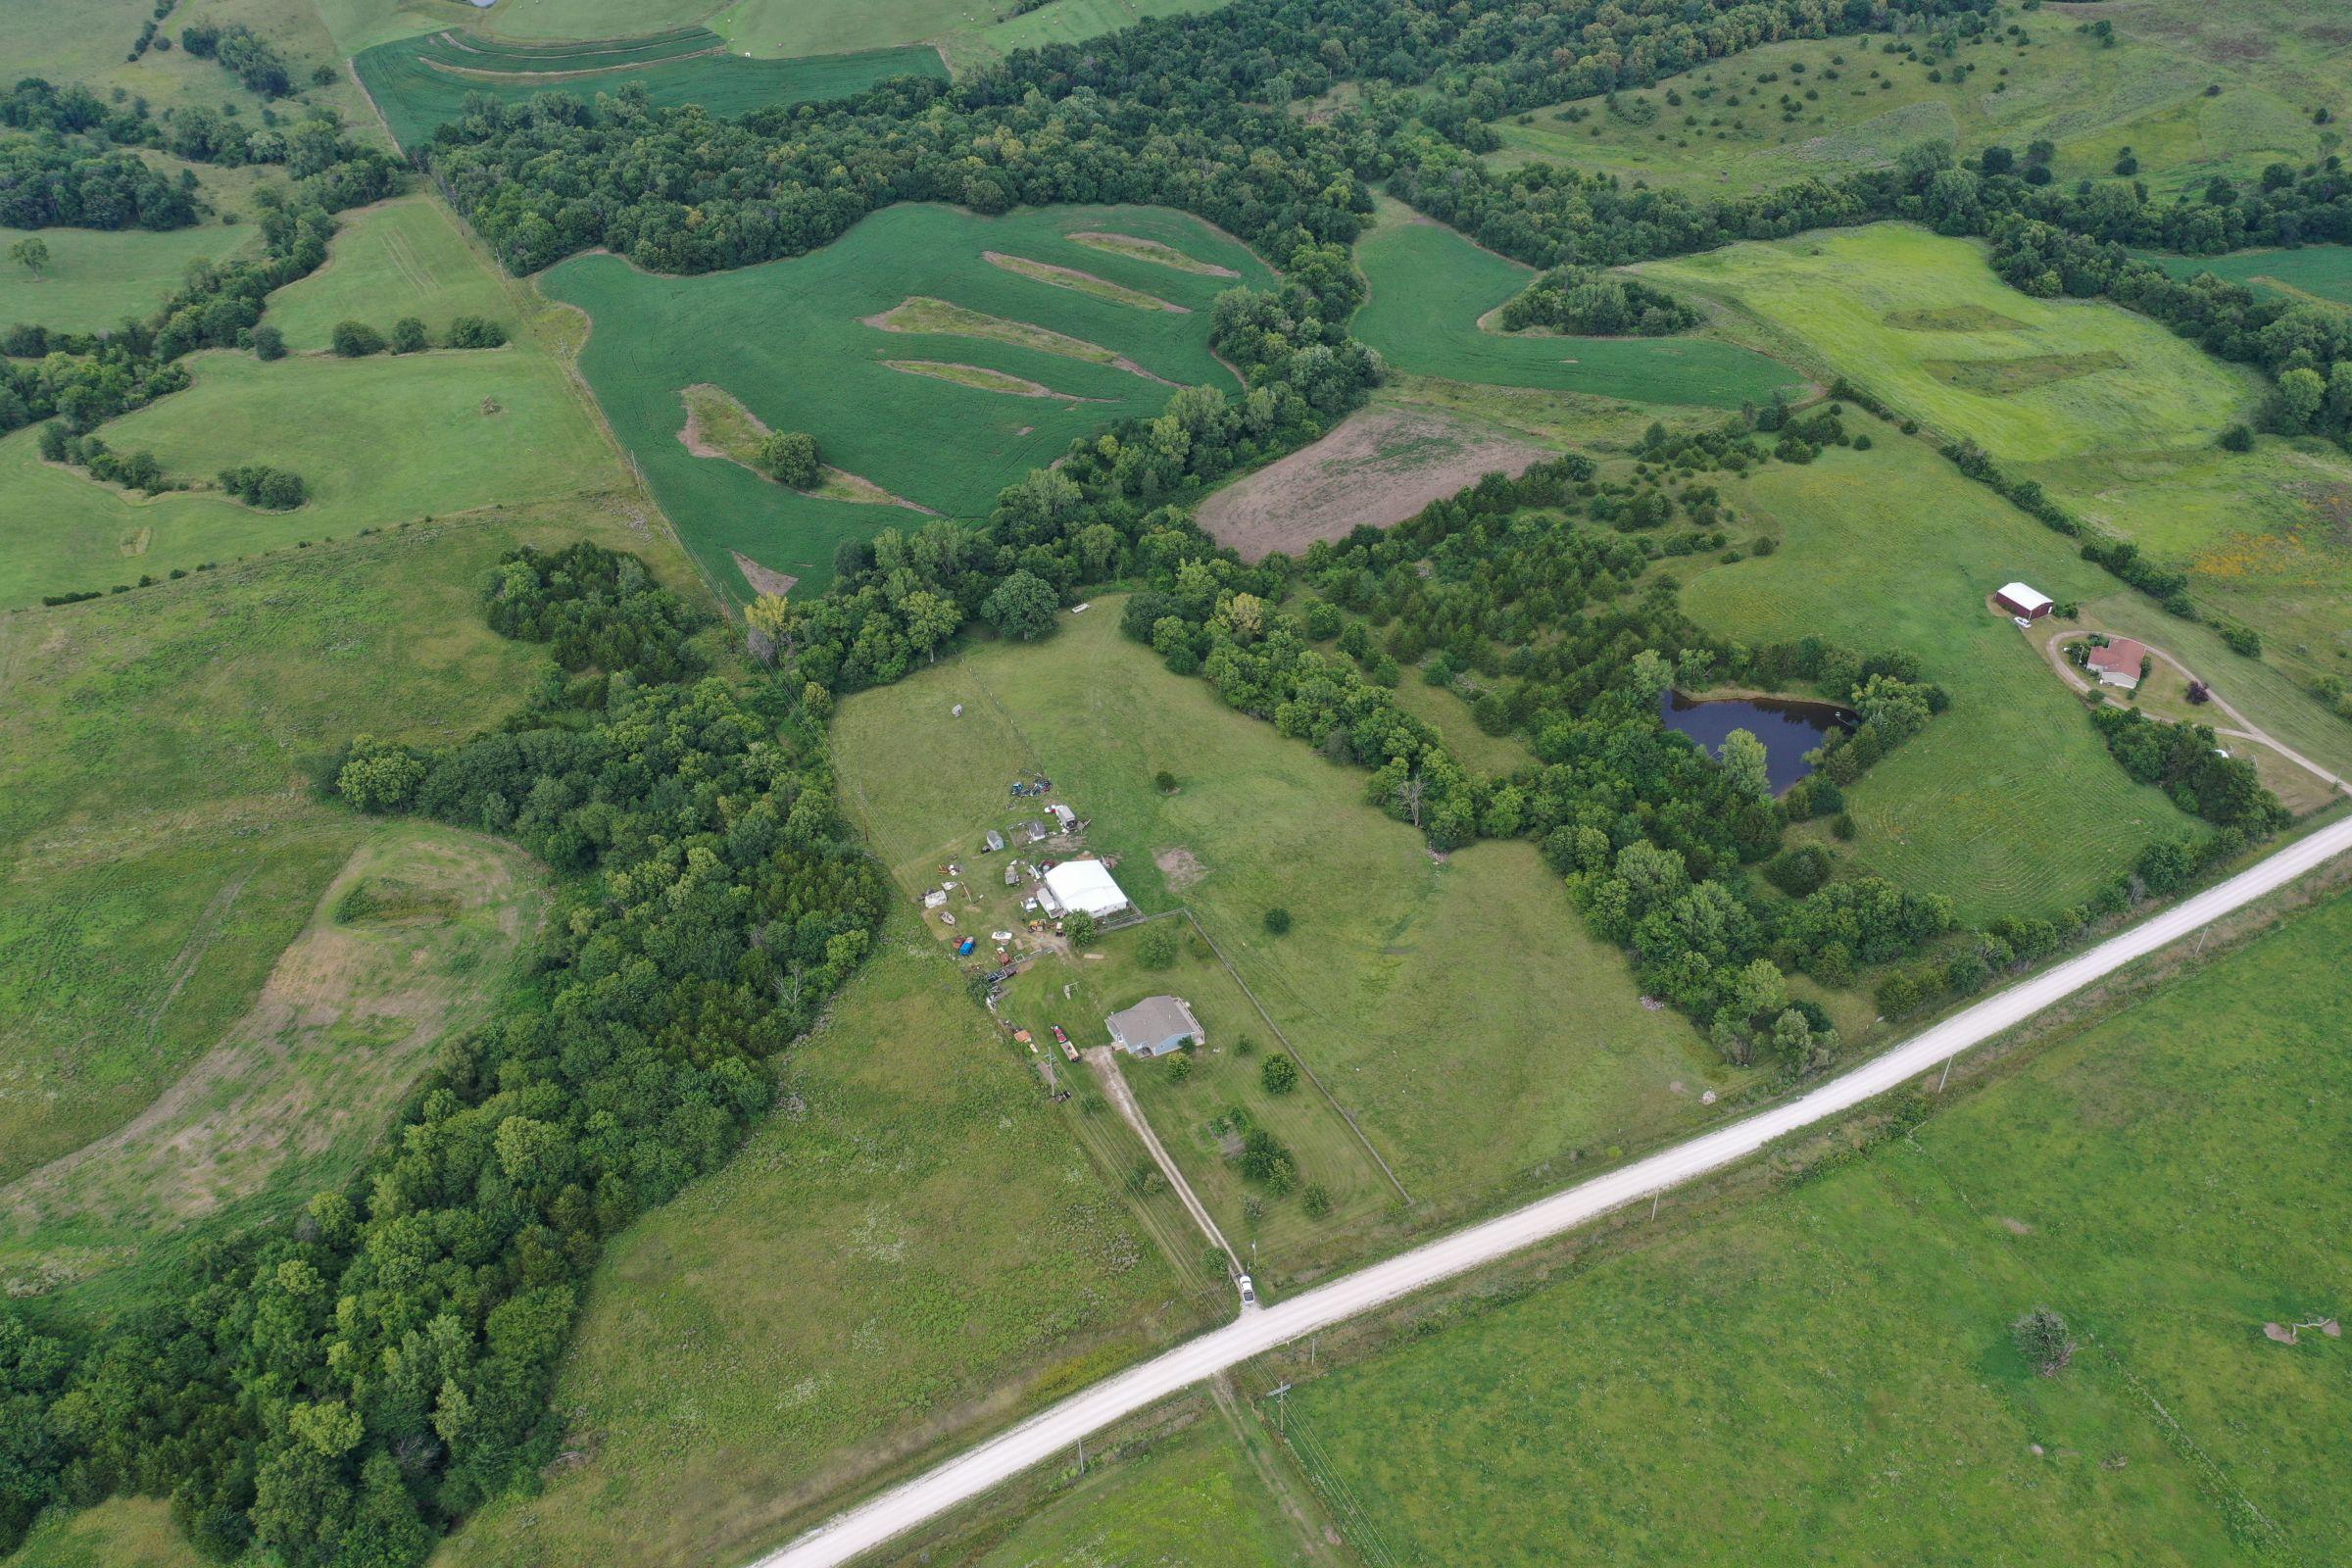 residential-warren-county-iowa-12-acres-listing-number-15104-1-2020-08-08-185048.jpg